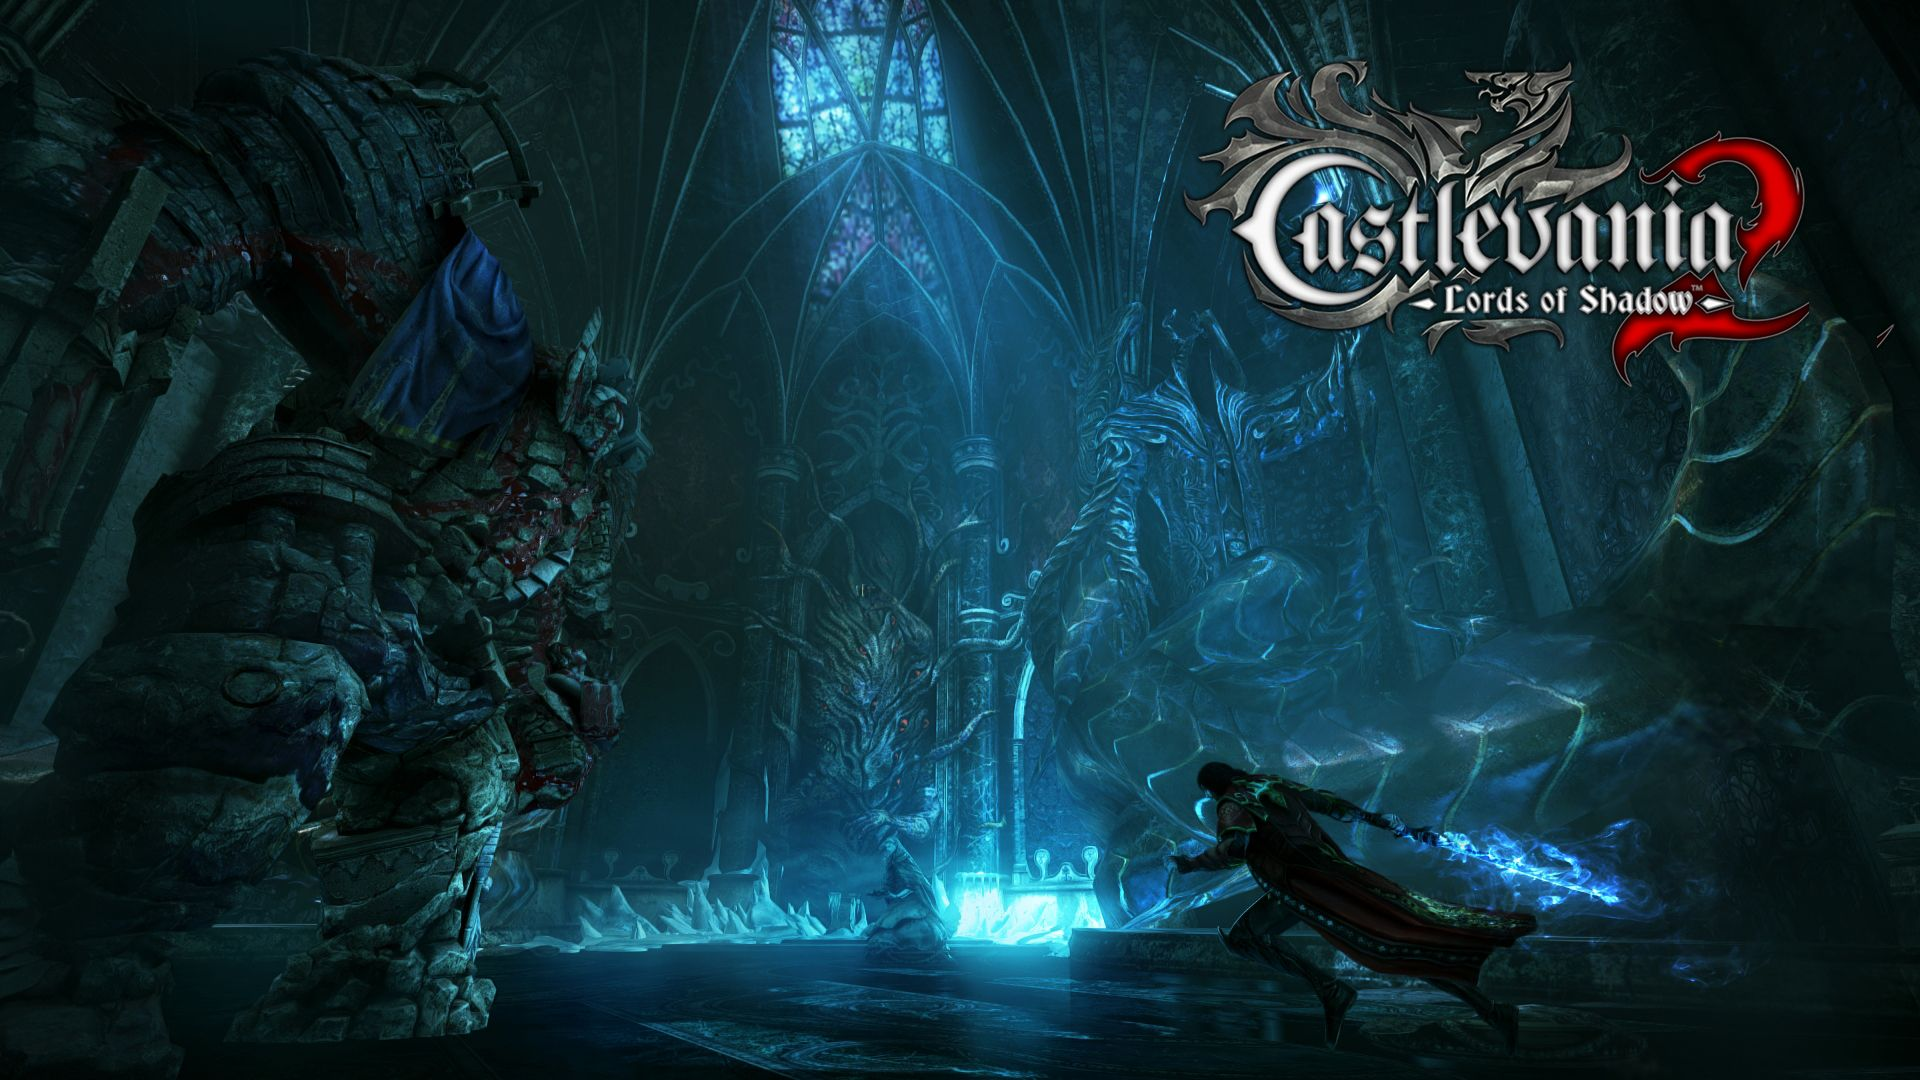 full hd 1080p castlevania lords of shadow 2 wallpapers hd, desktop